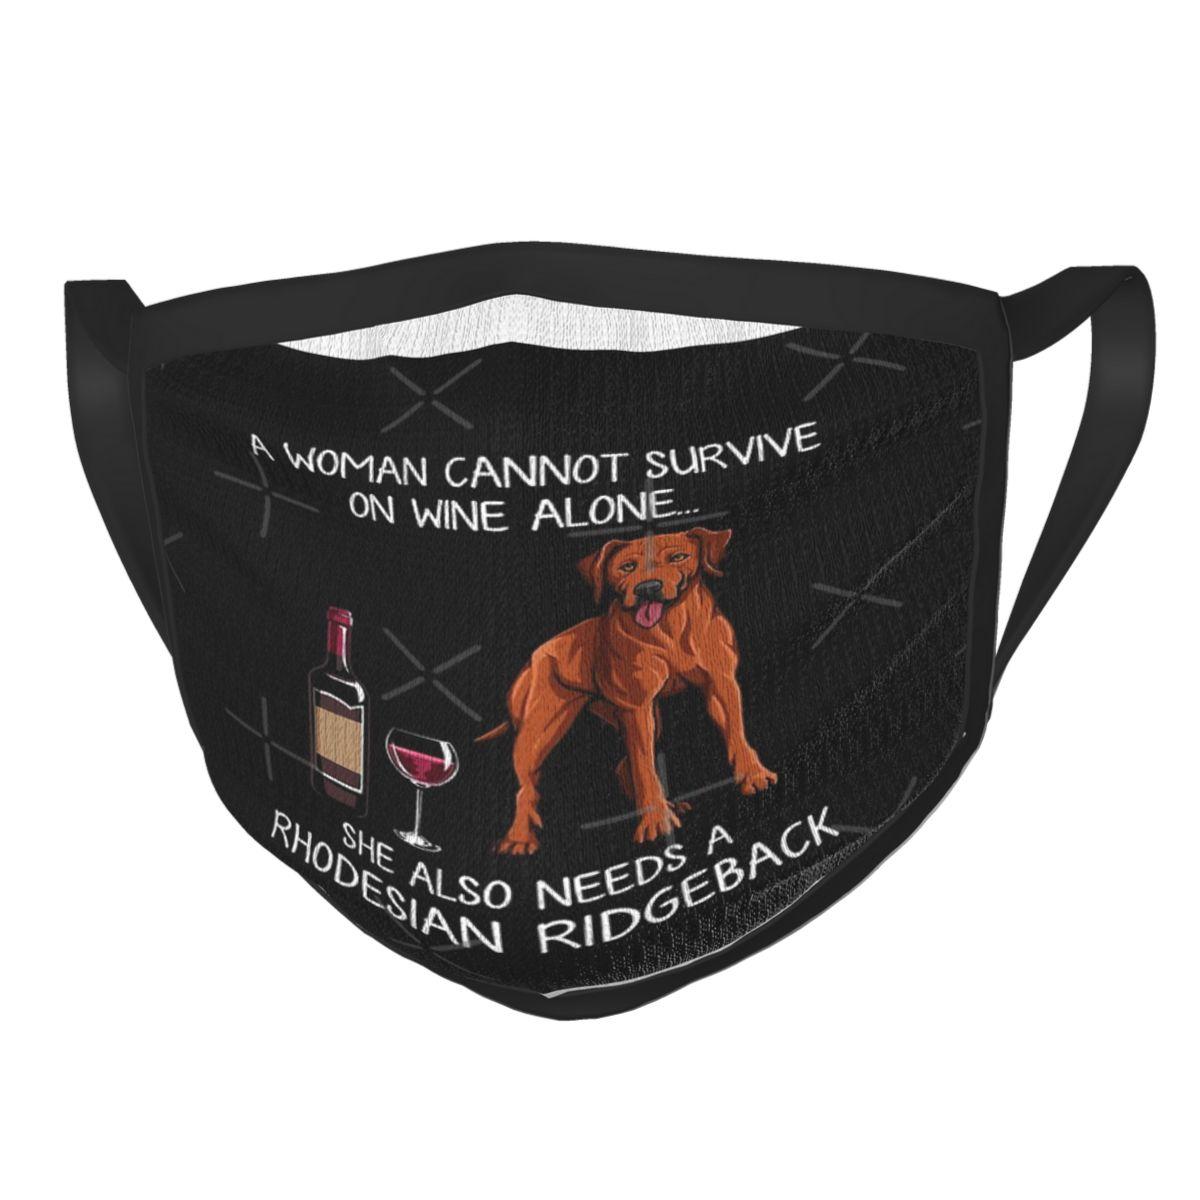 Rhodesian Ridgeback And Wine Funny Dog Hipster Black Border Mask